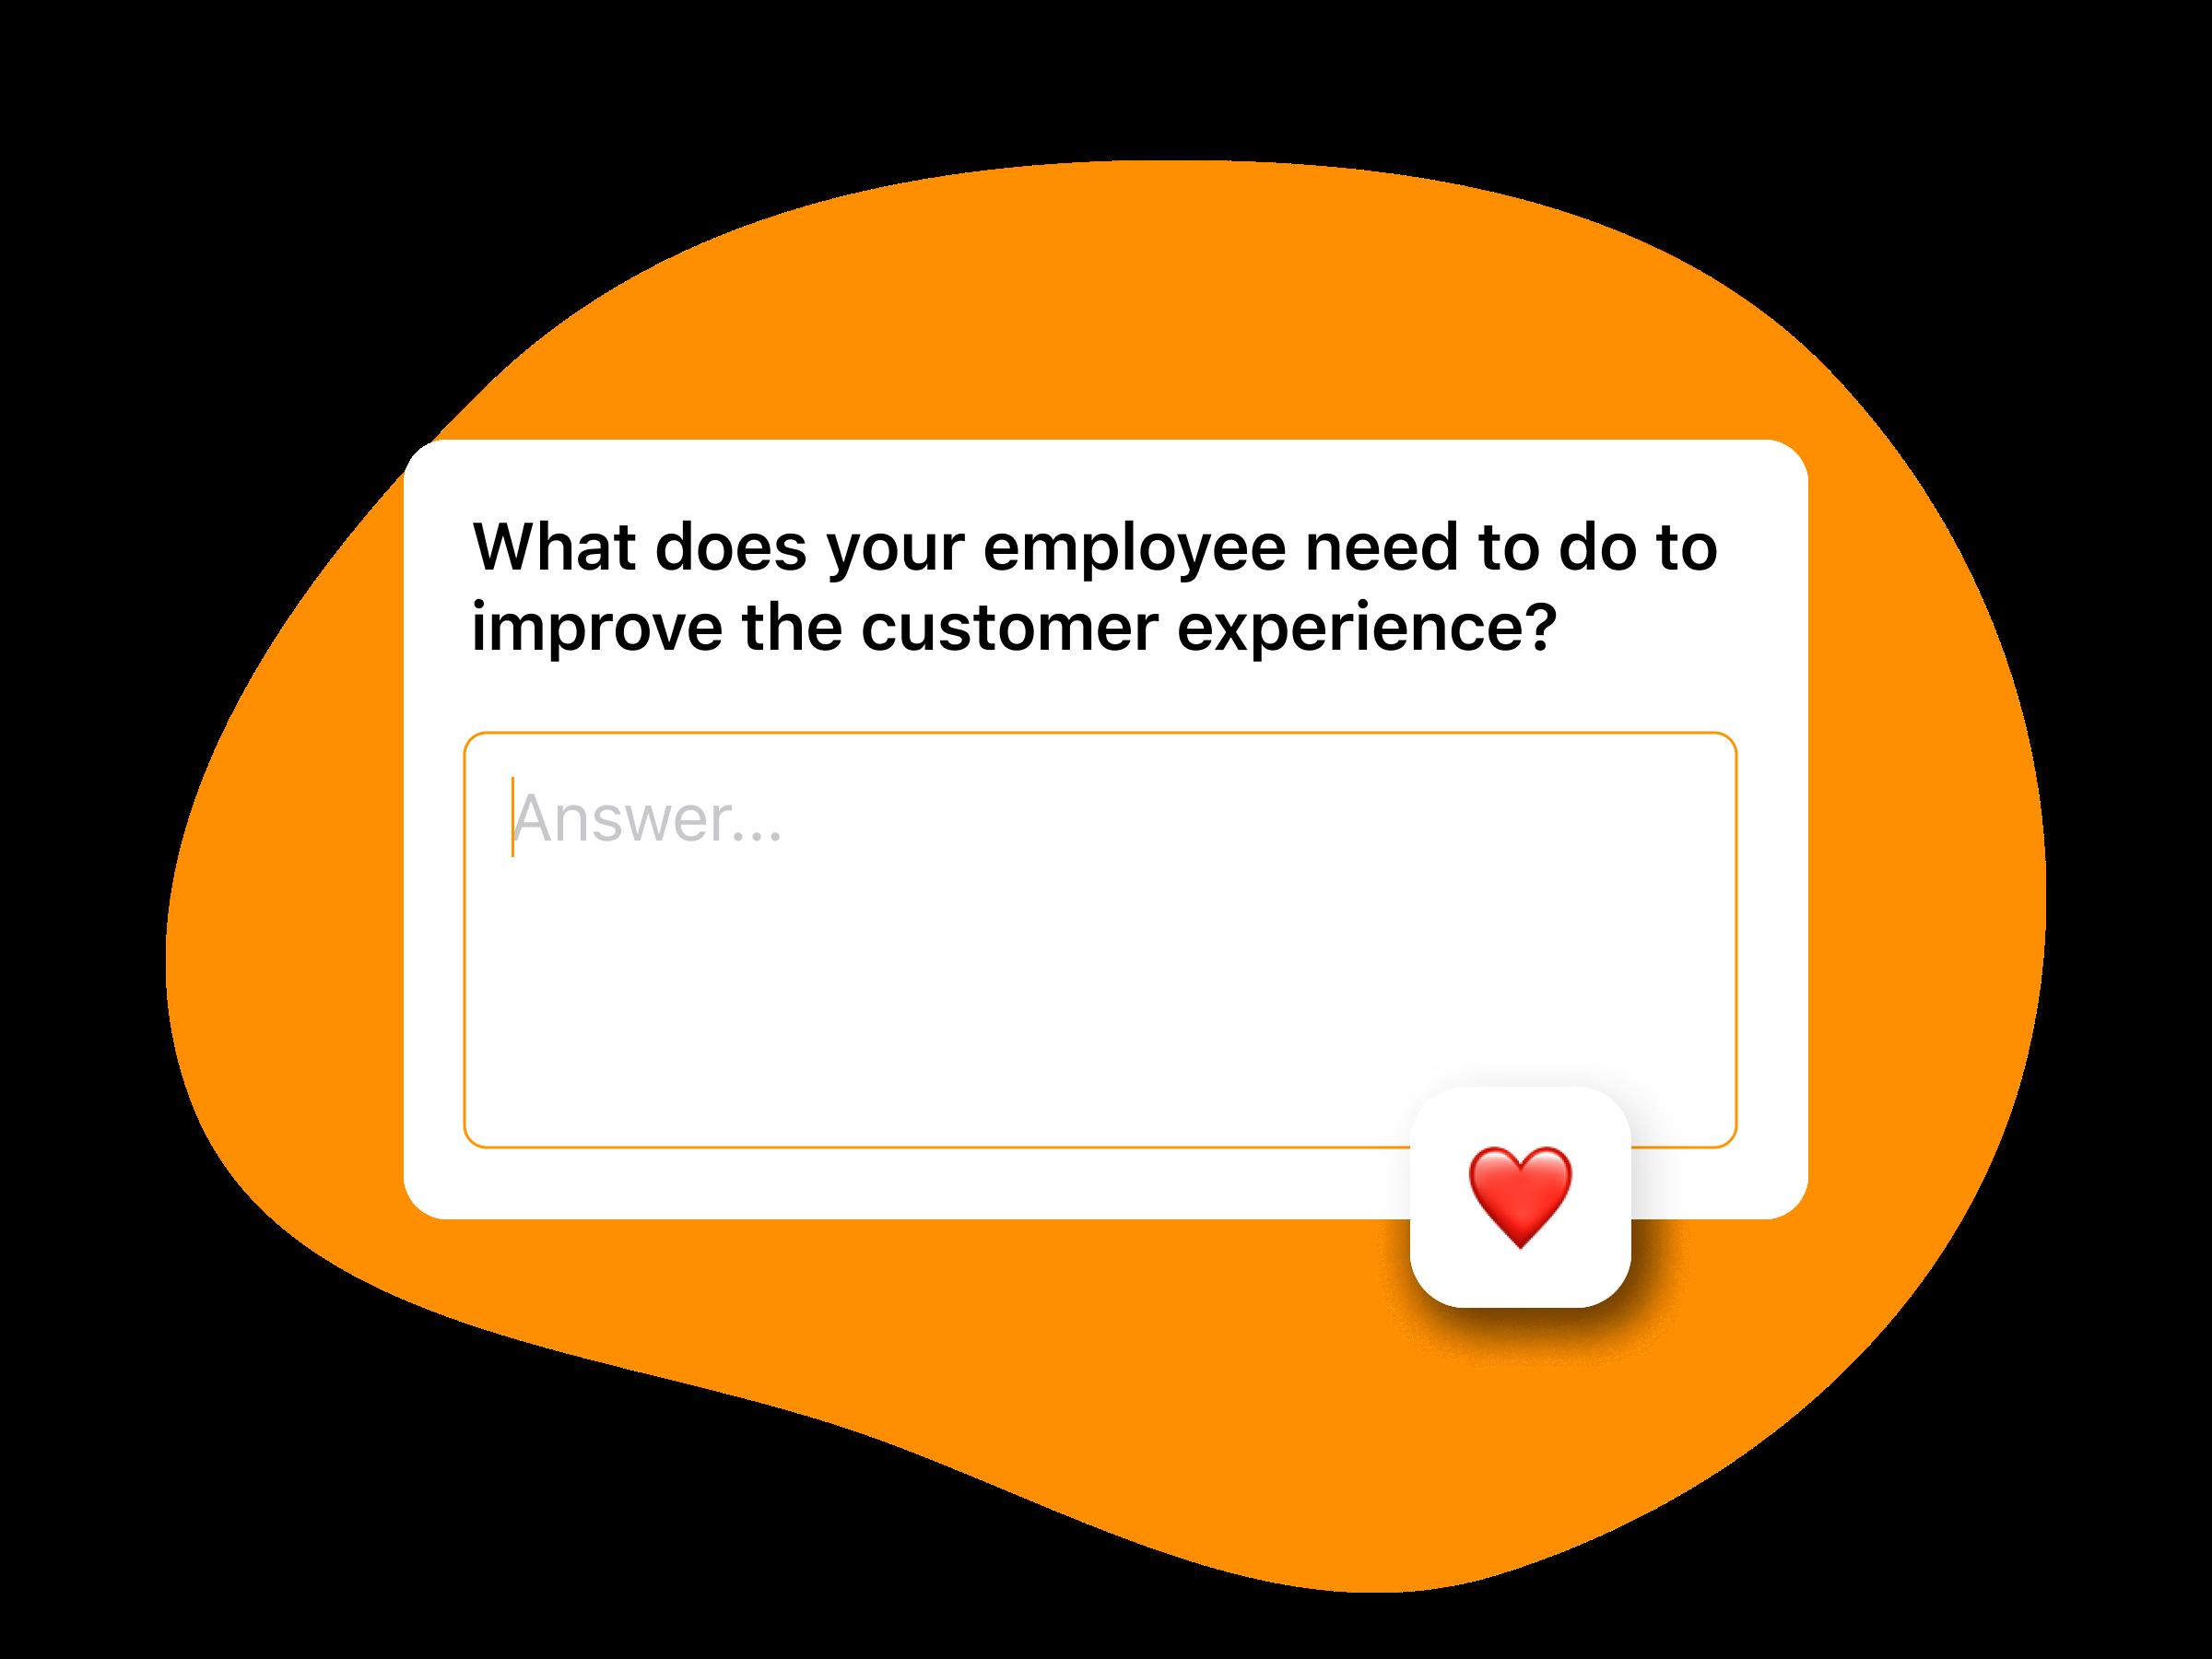 Increase employee engagement